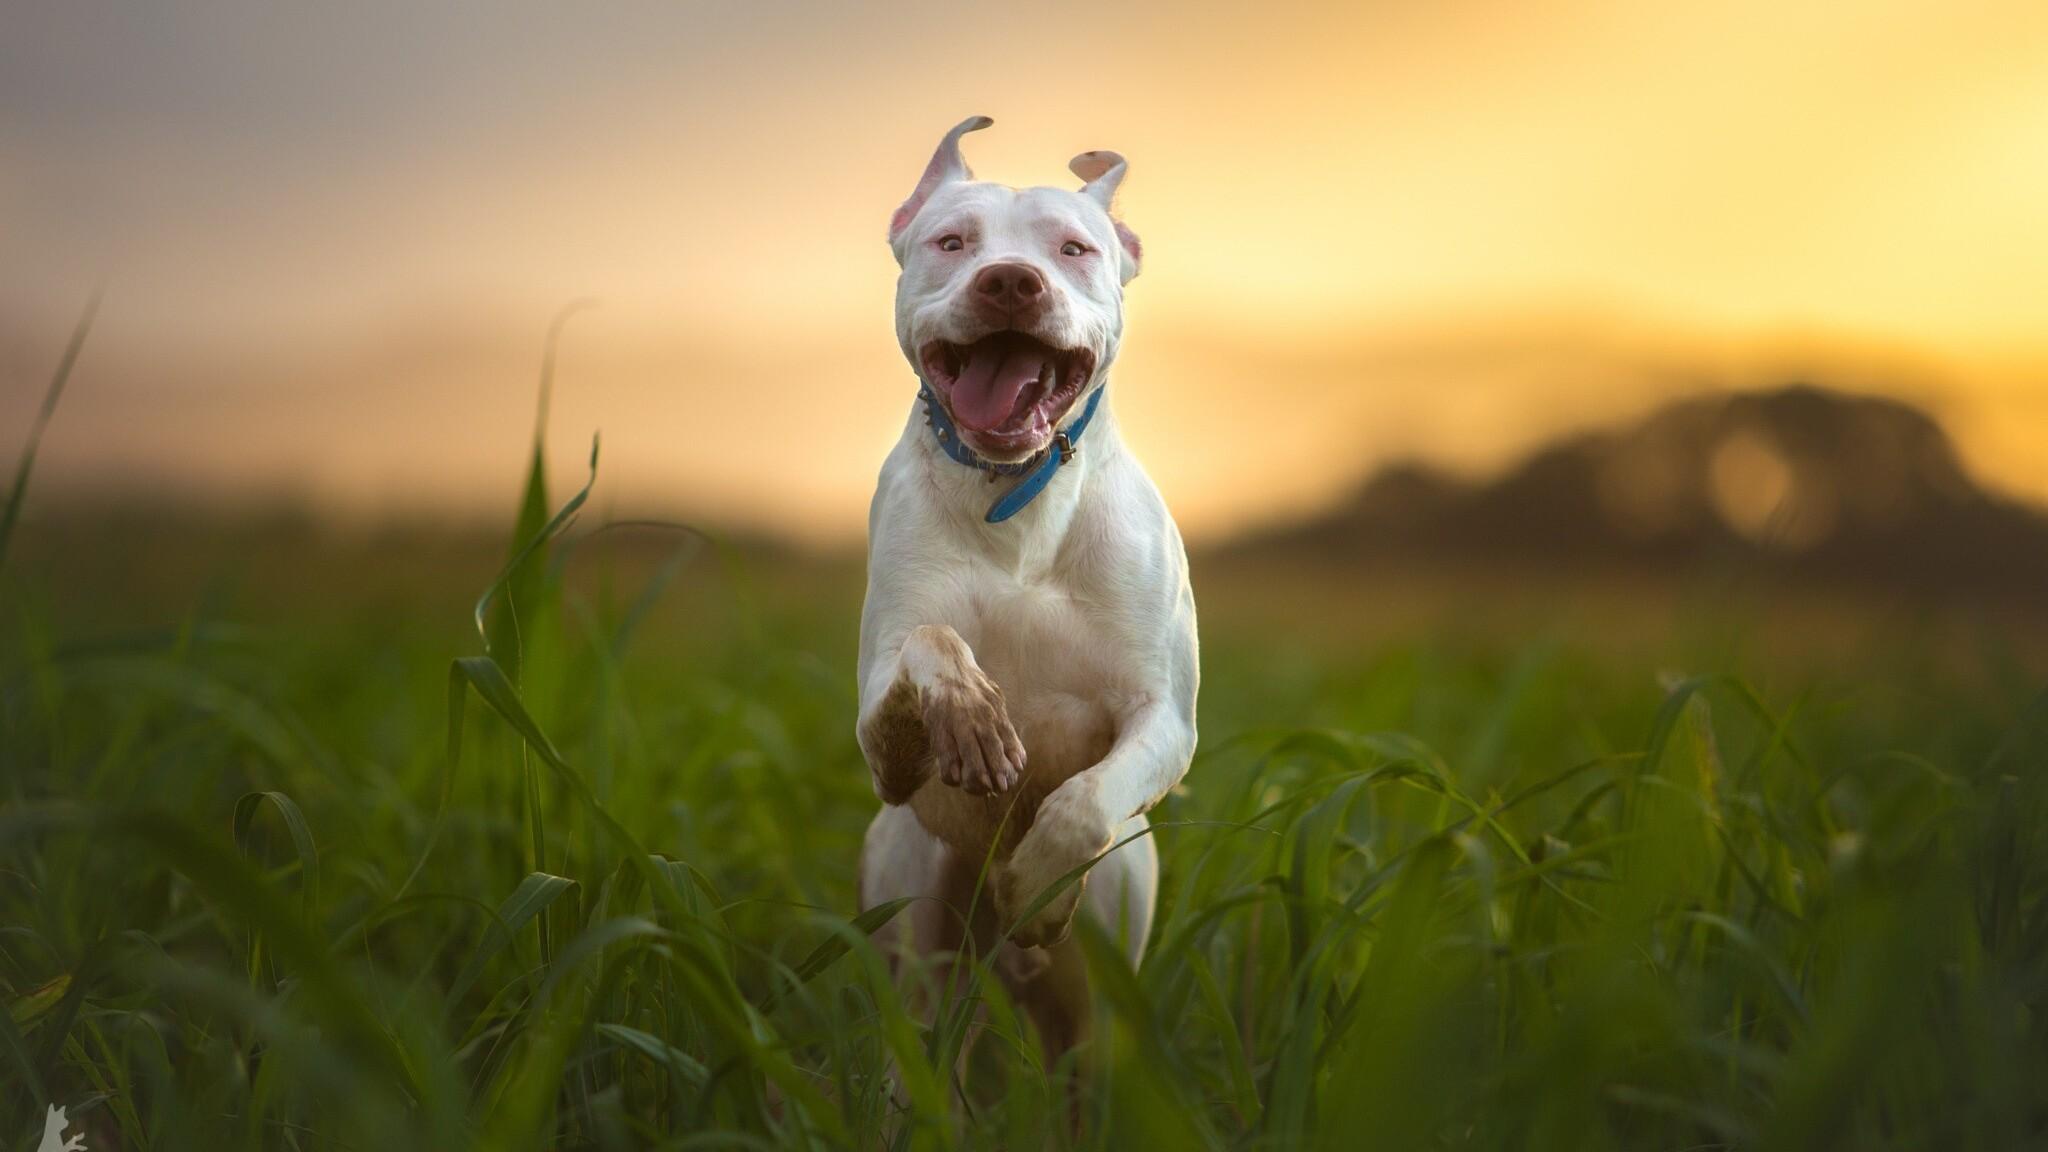 Pitbulls And Girls Wallpaper 2048x1152 Pitbull Dog Breed Running 2048x1152 Resolution